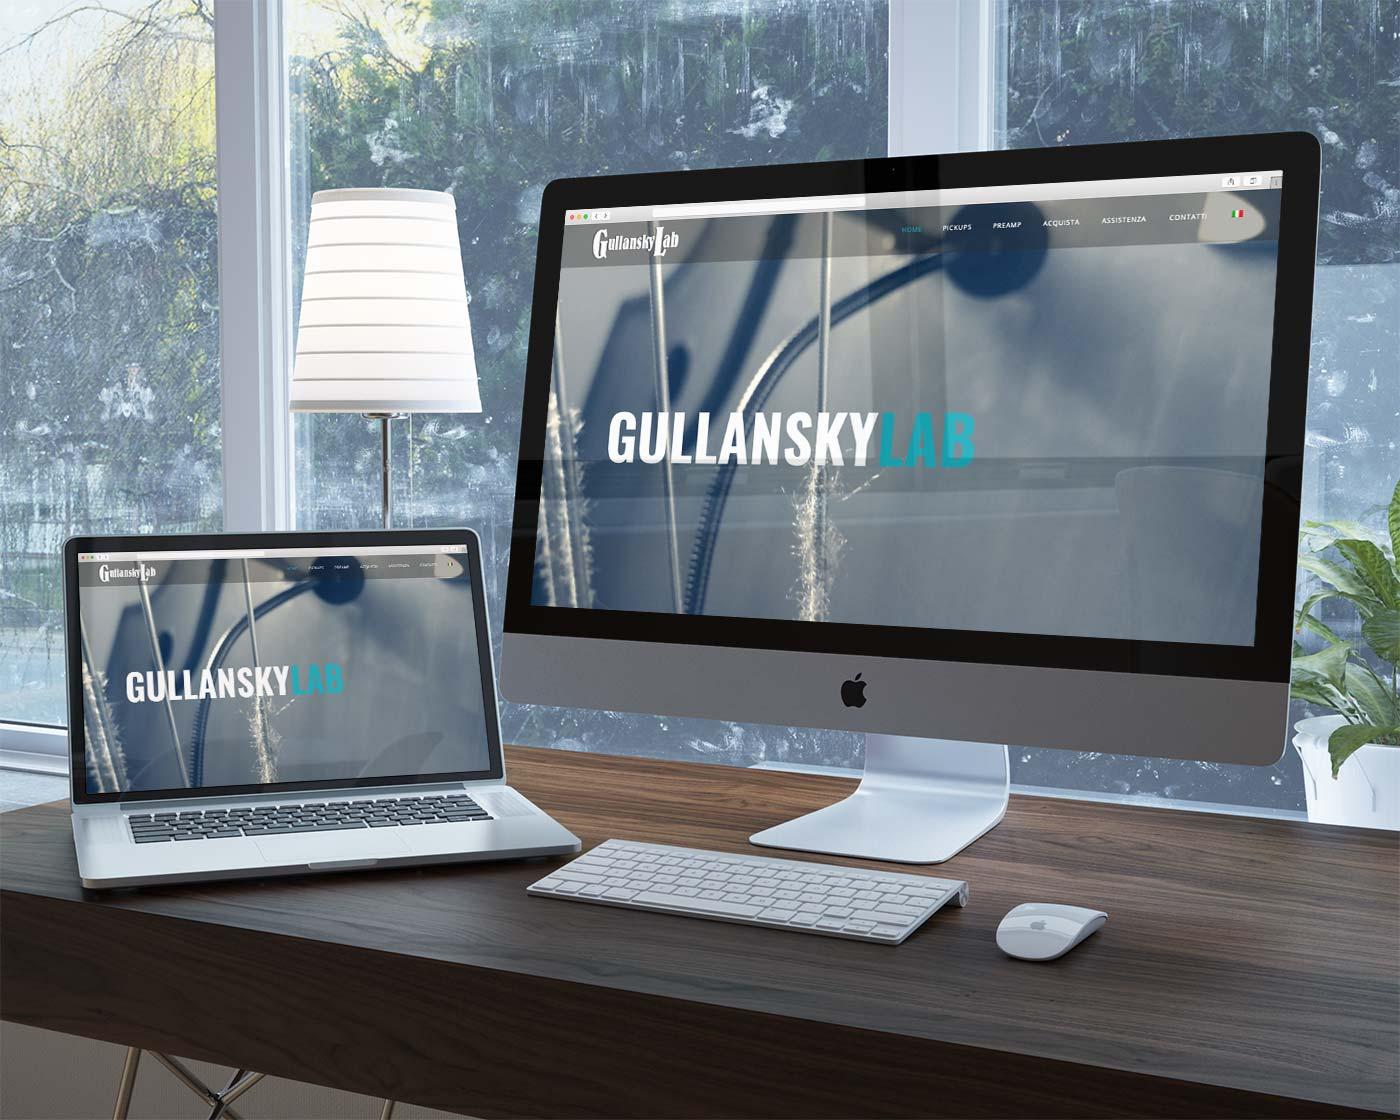 Gullansky